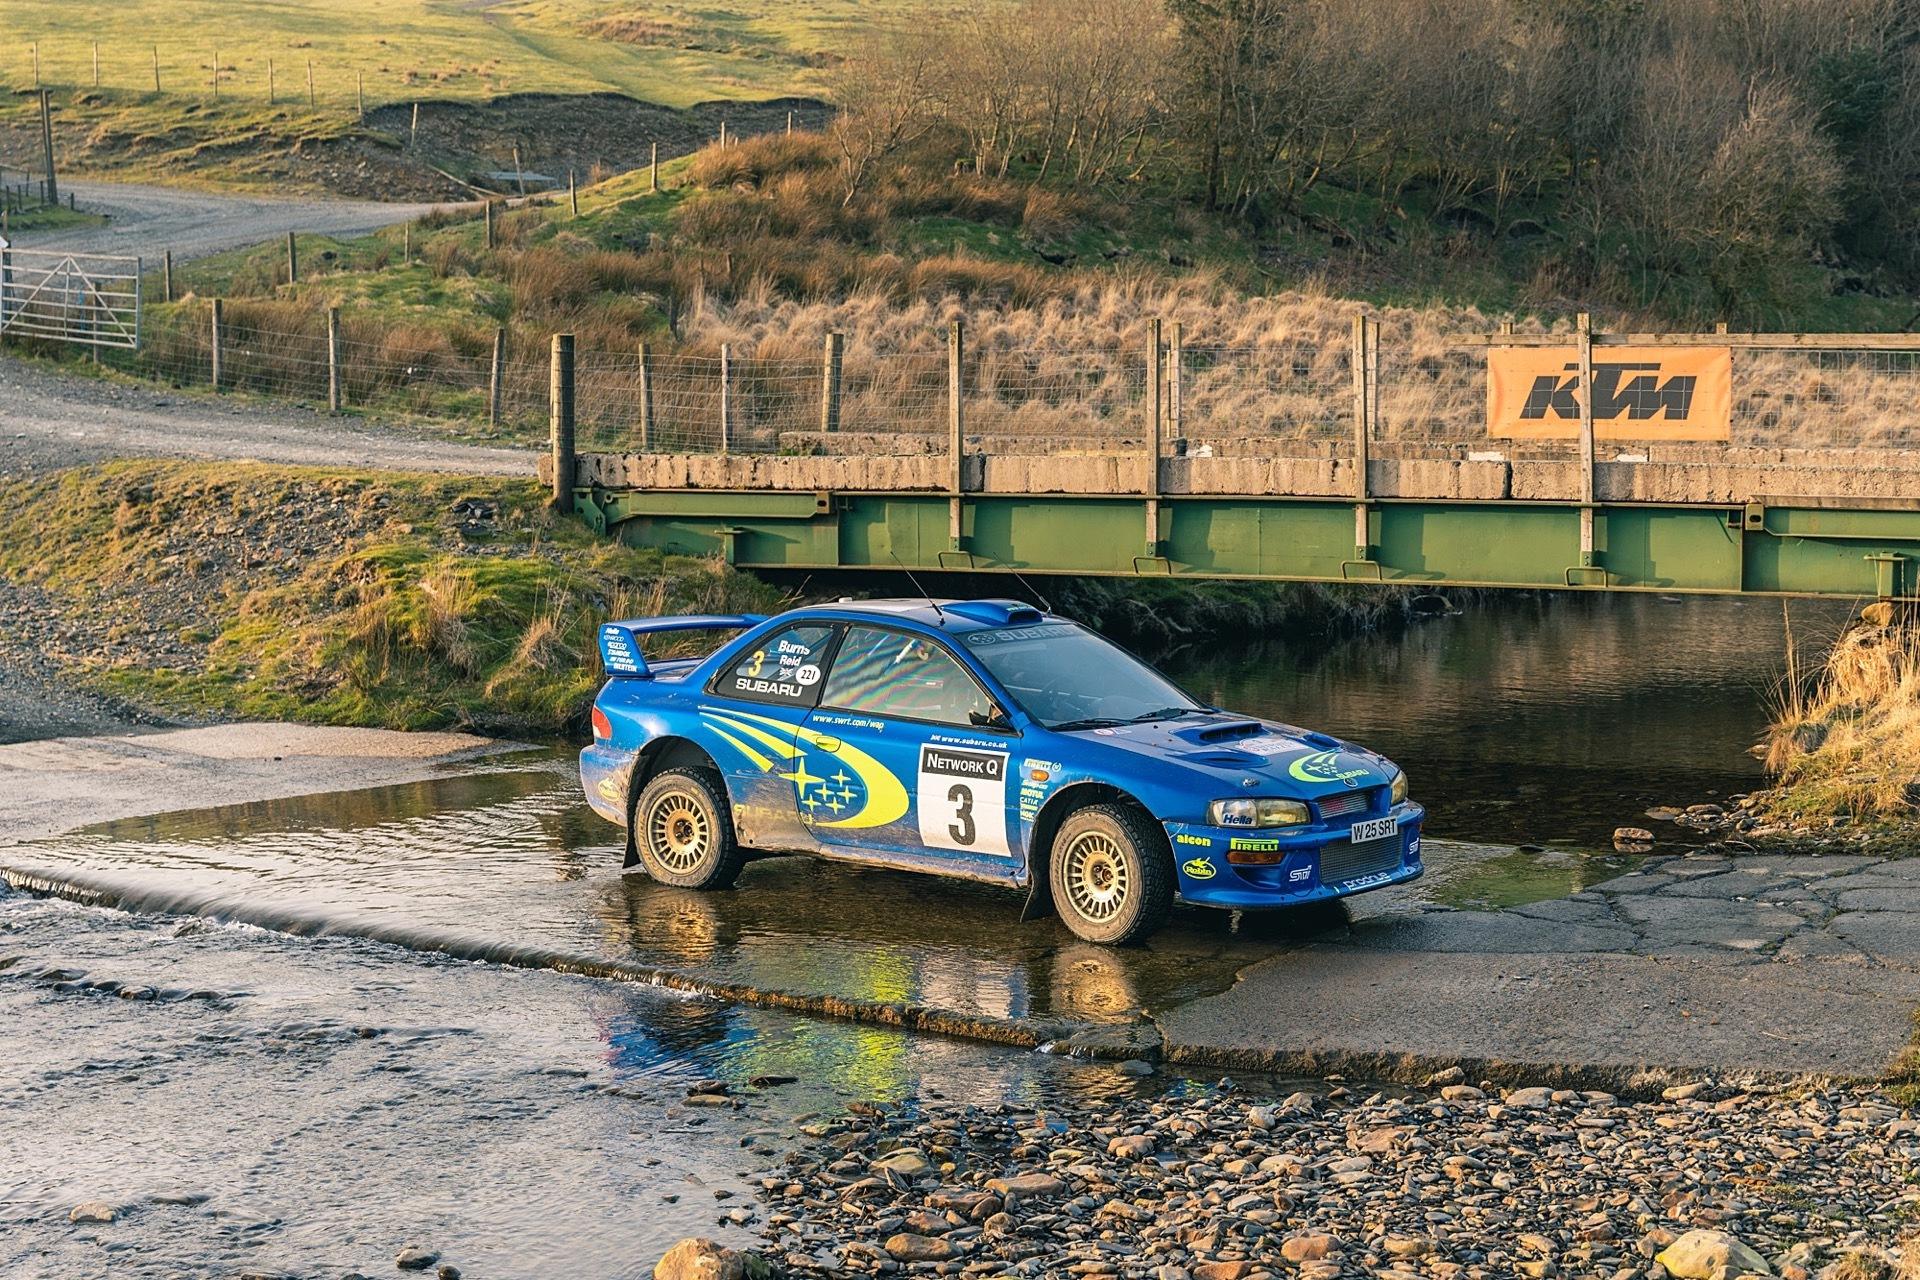 Richard_Burns_Subaru_Impreza_WRC_sale-0014